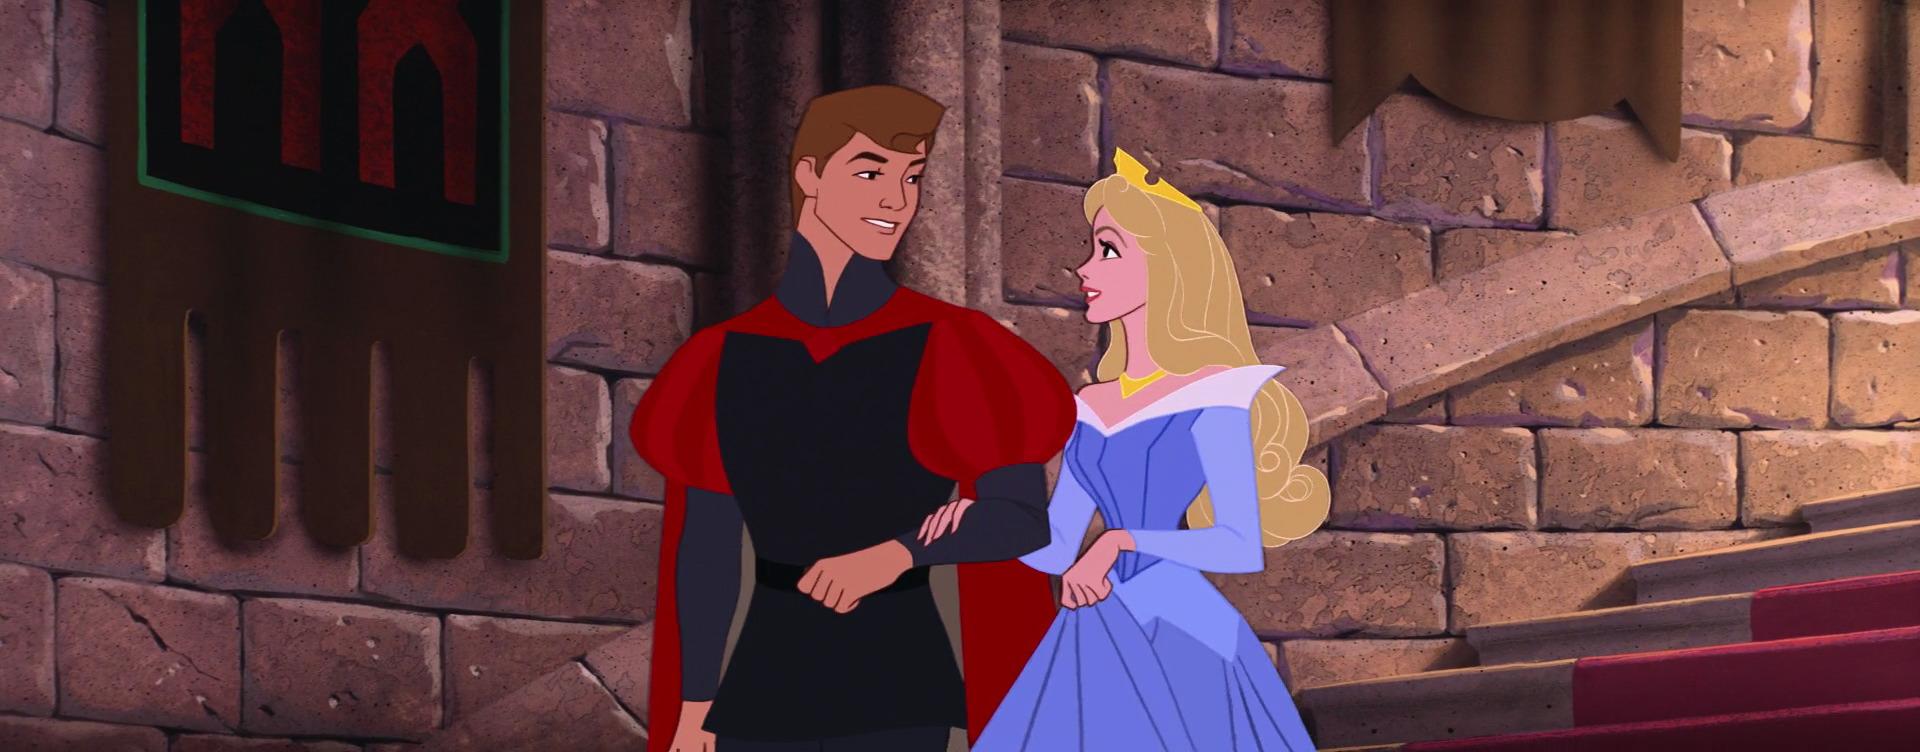 Image Sleeping Beauty Disneyscreencaps Com 8476 Jpg